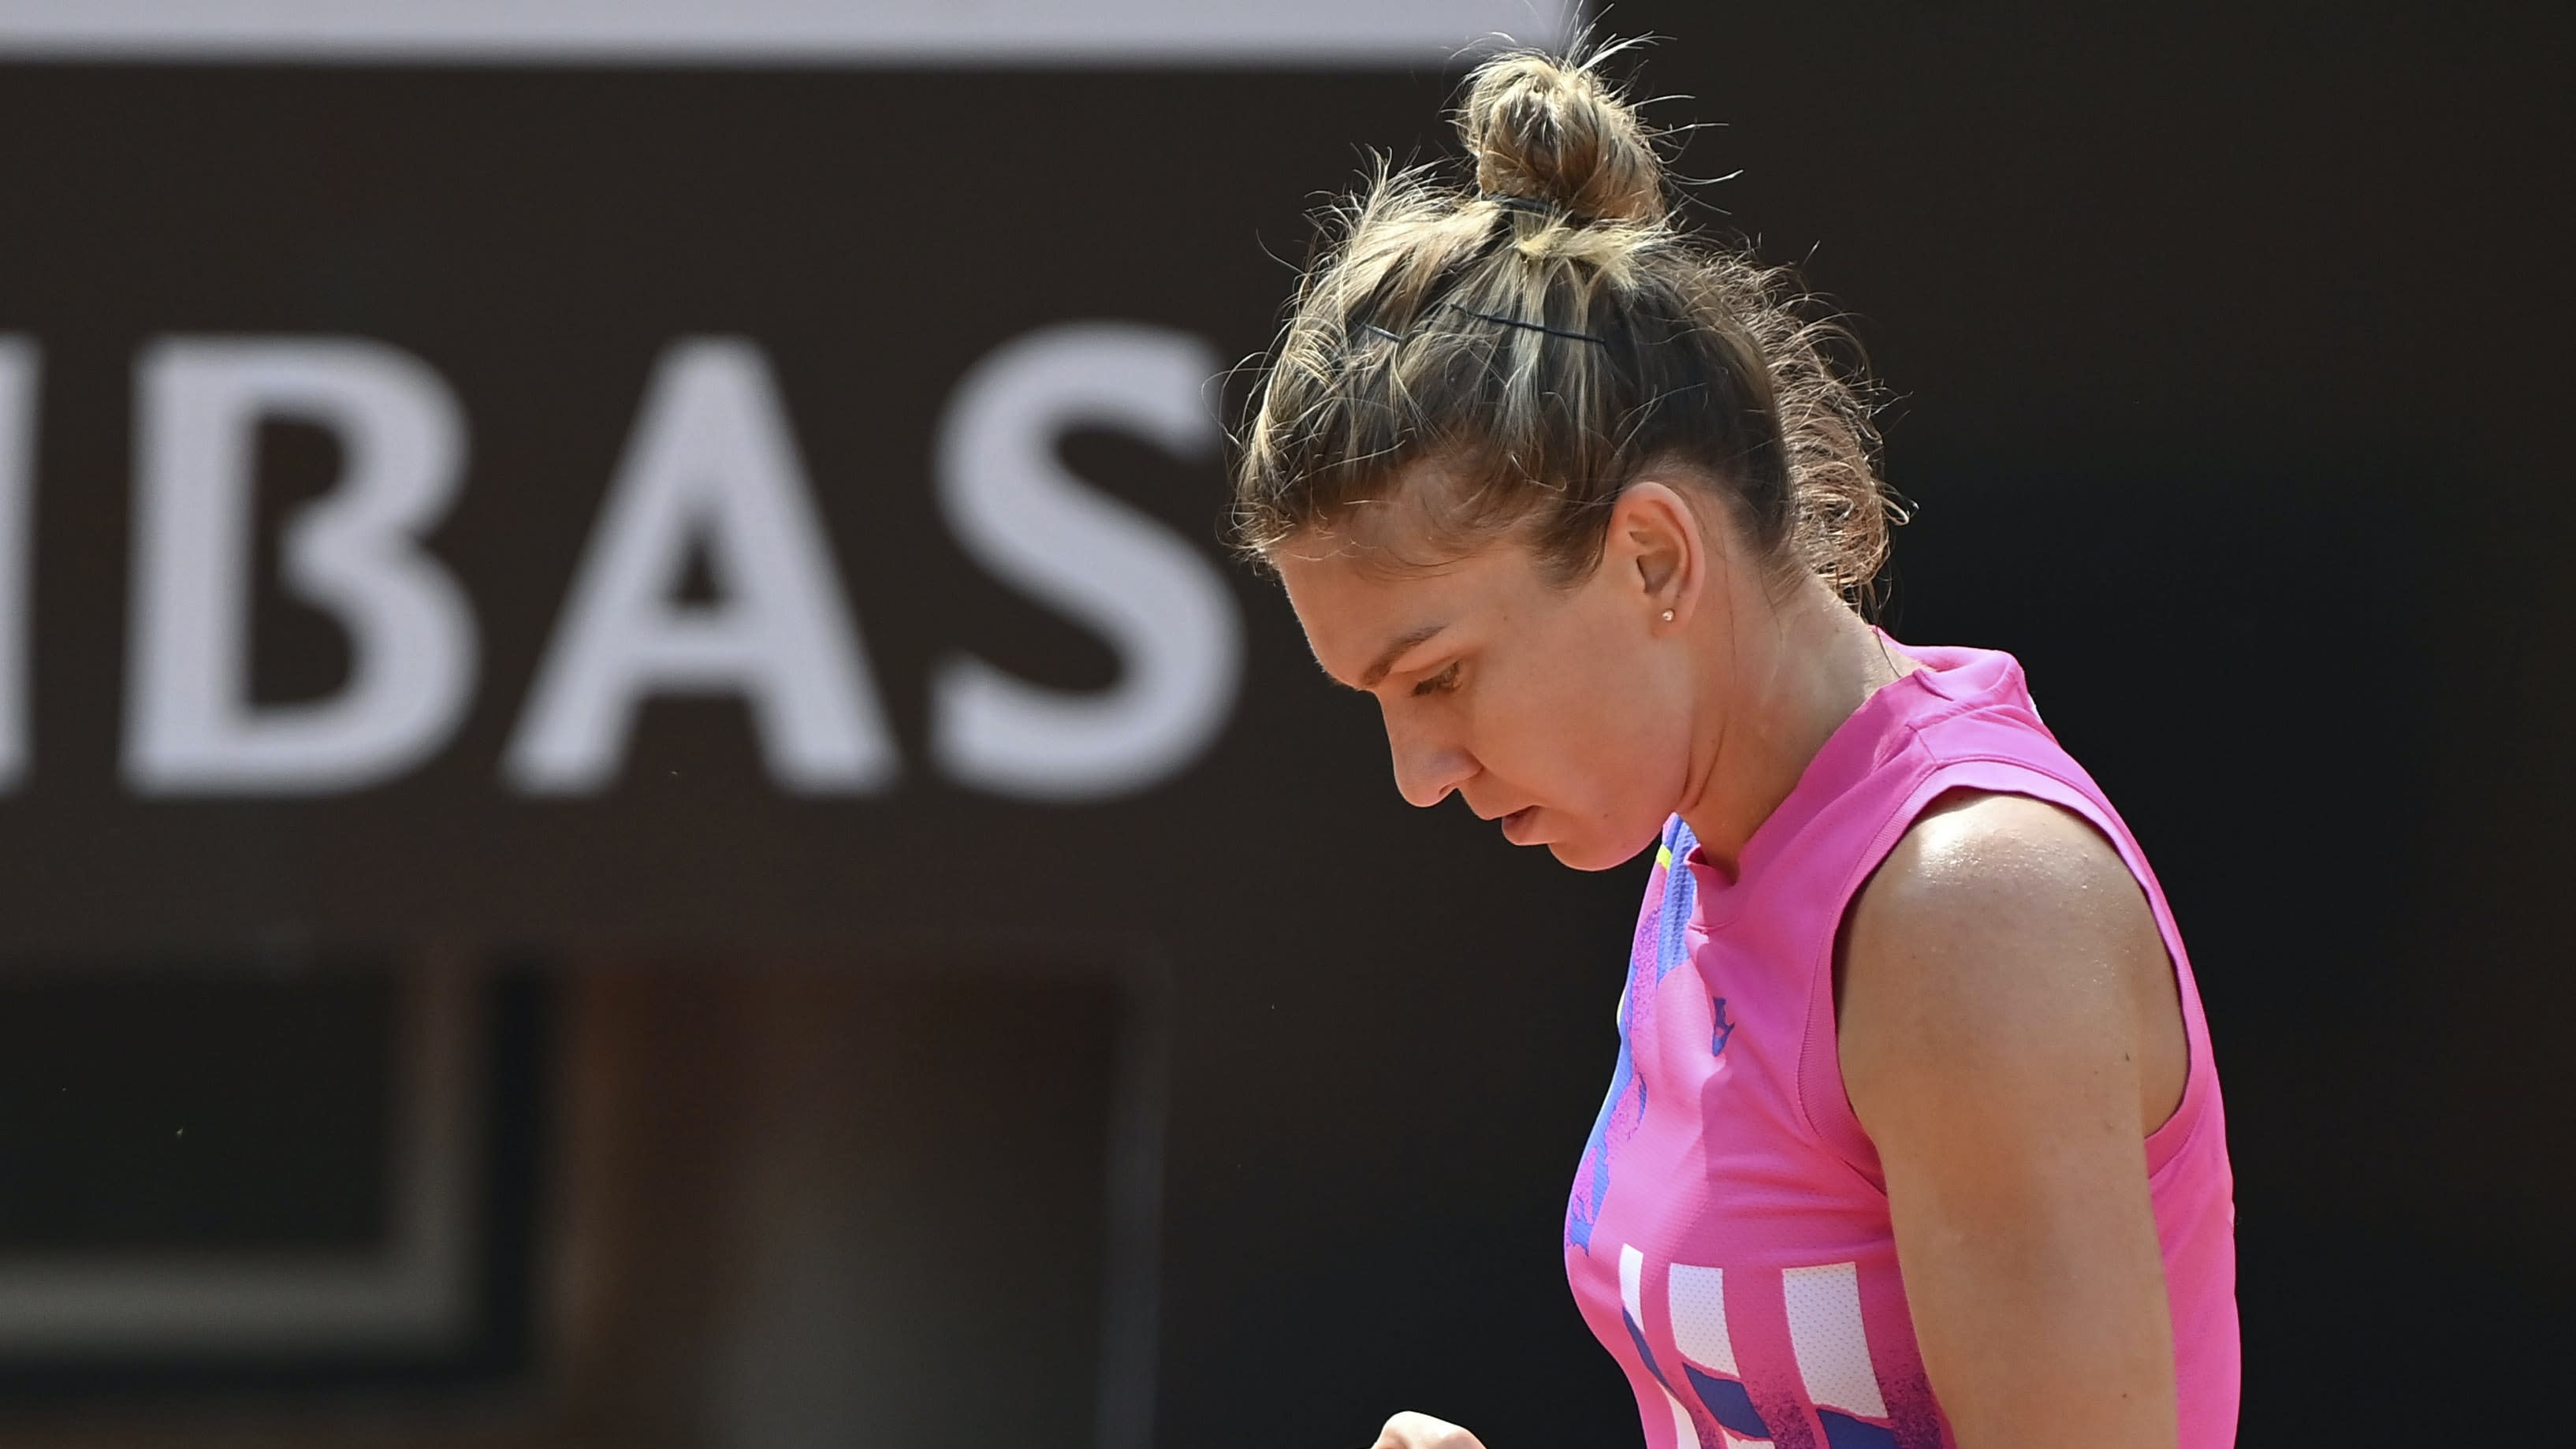 Simona Halep reaches Italian Open semis after Yulia Putintseva retires injured